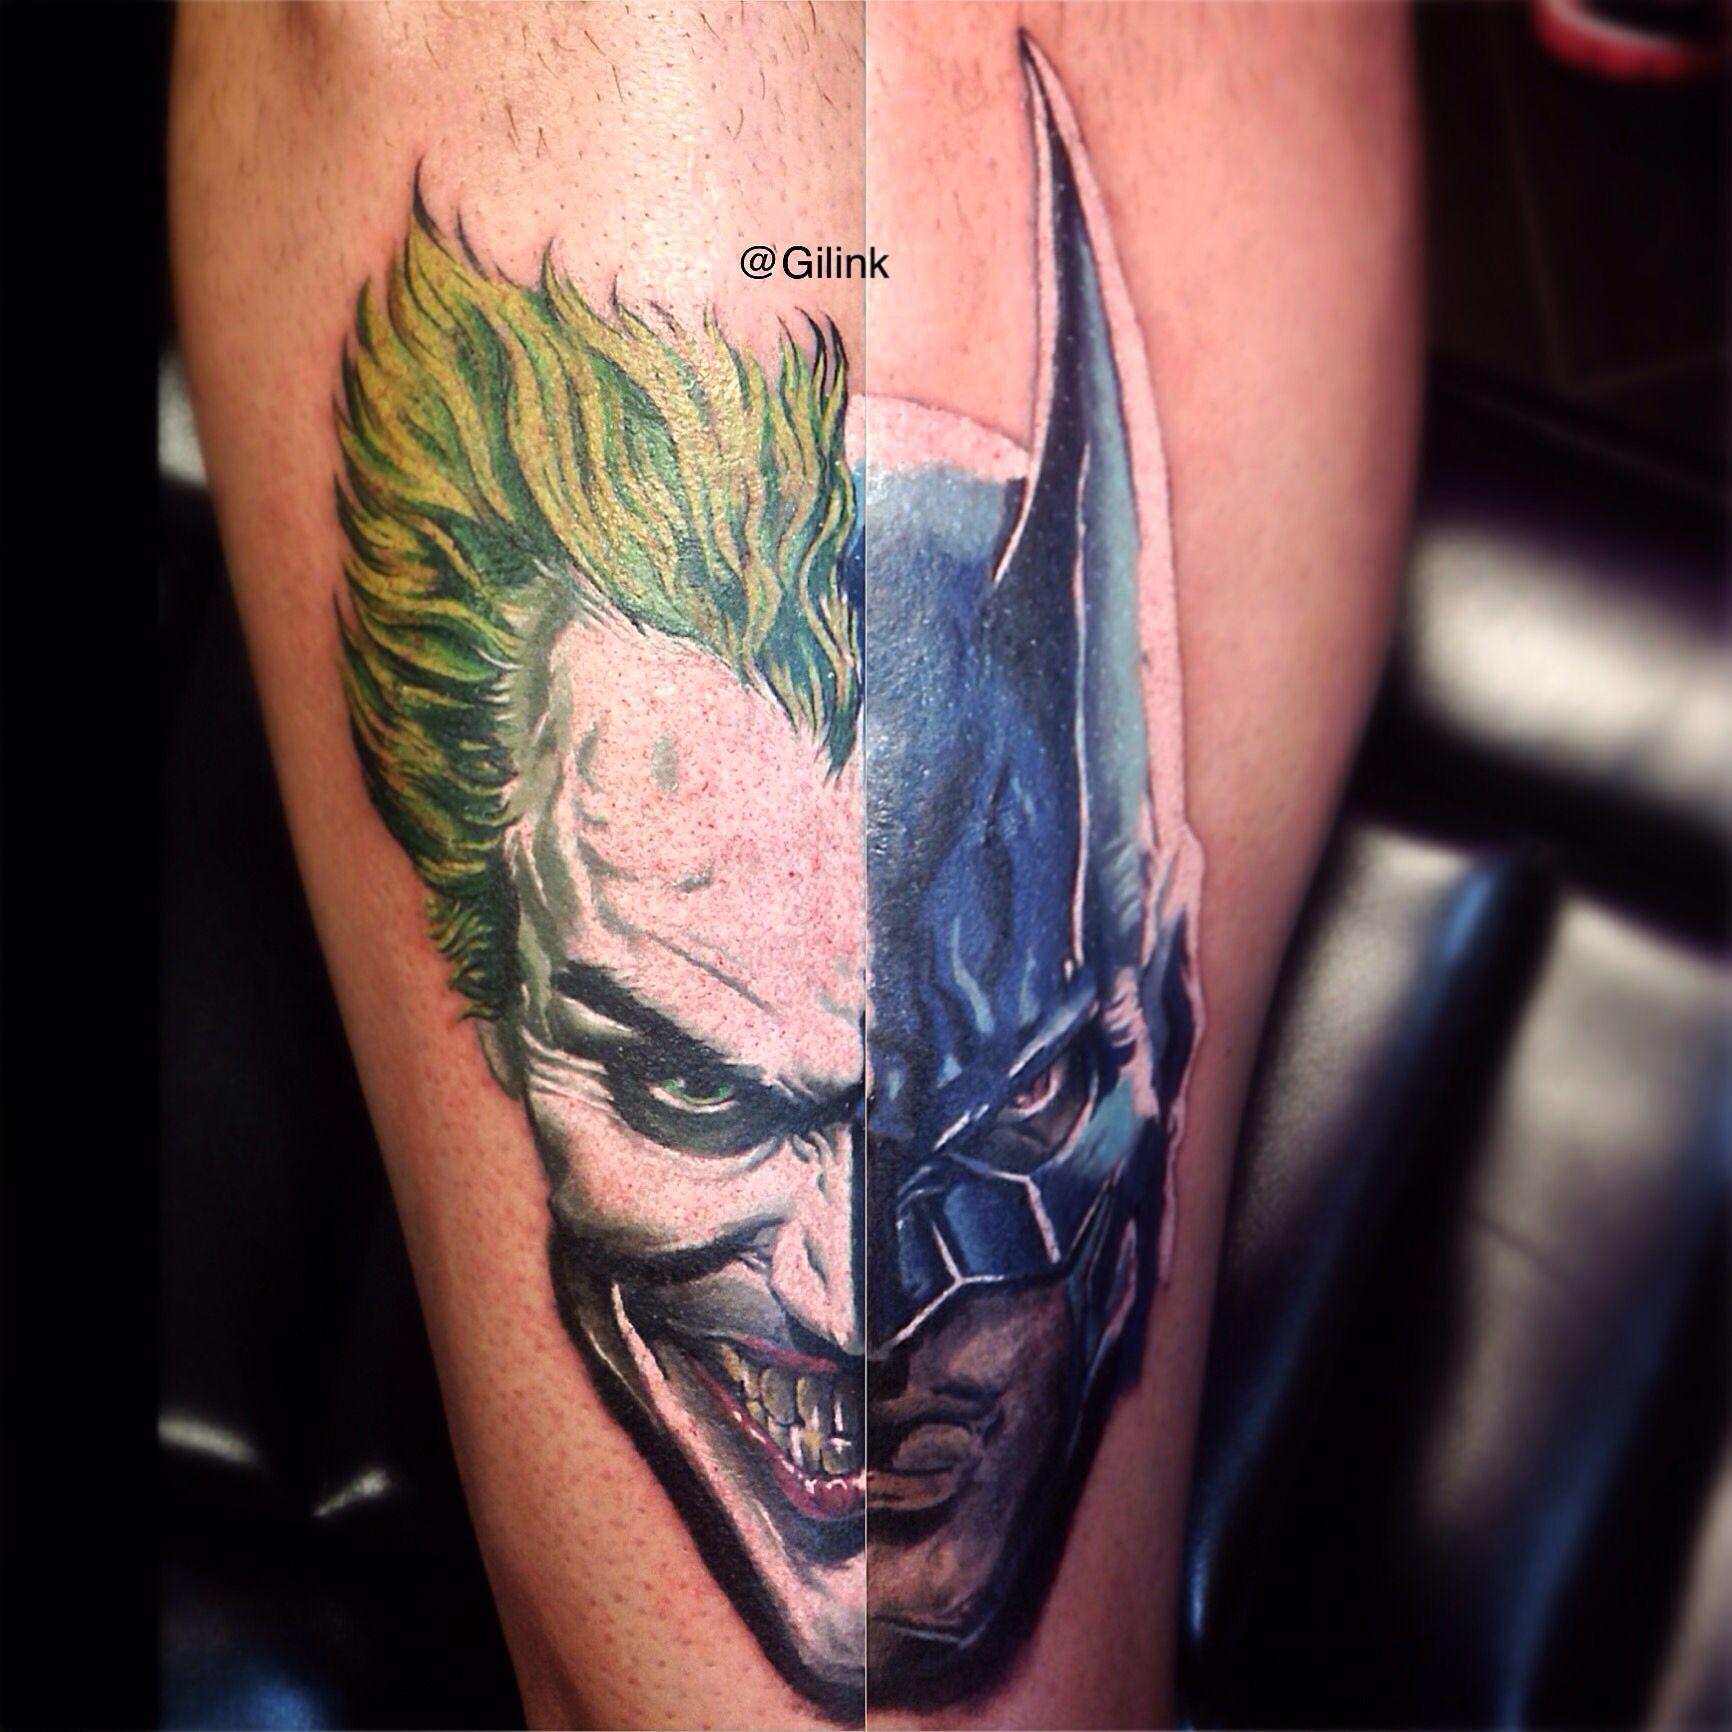 batman joker dc comics color tattoo tattoos portrait gotham harley quinn tattoos. Black Bedroom Furniture Sets. Home Design Ideas